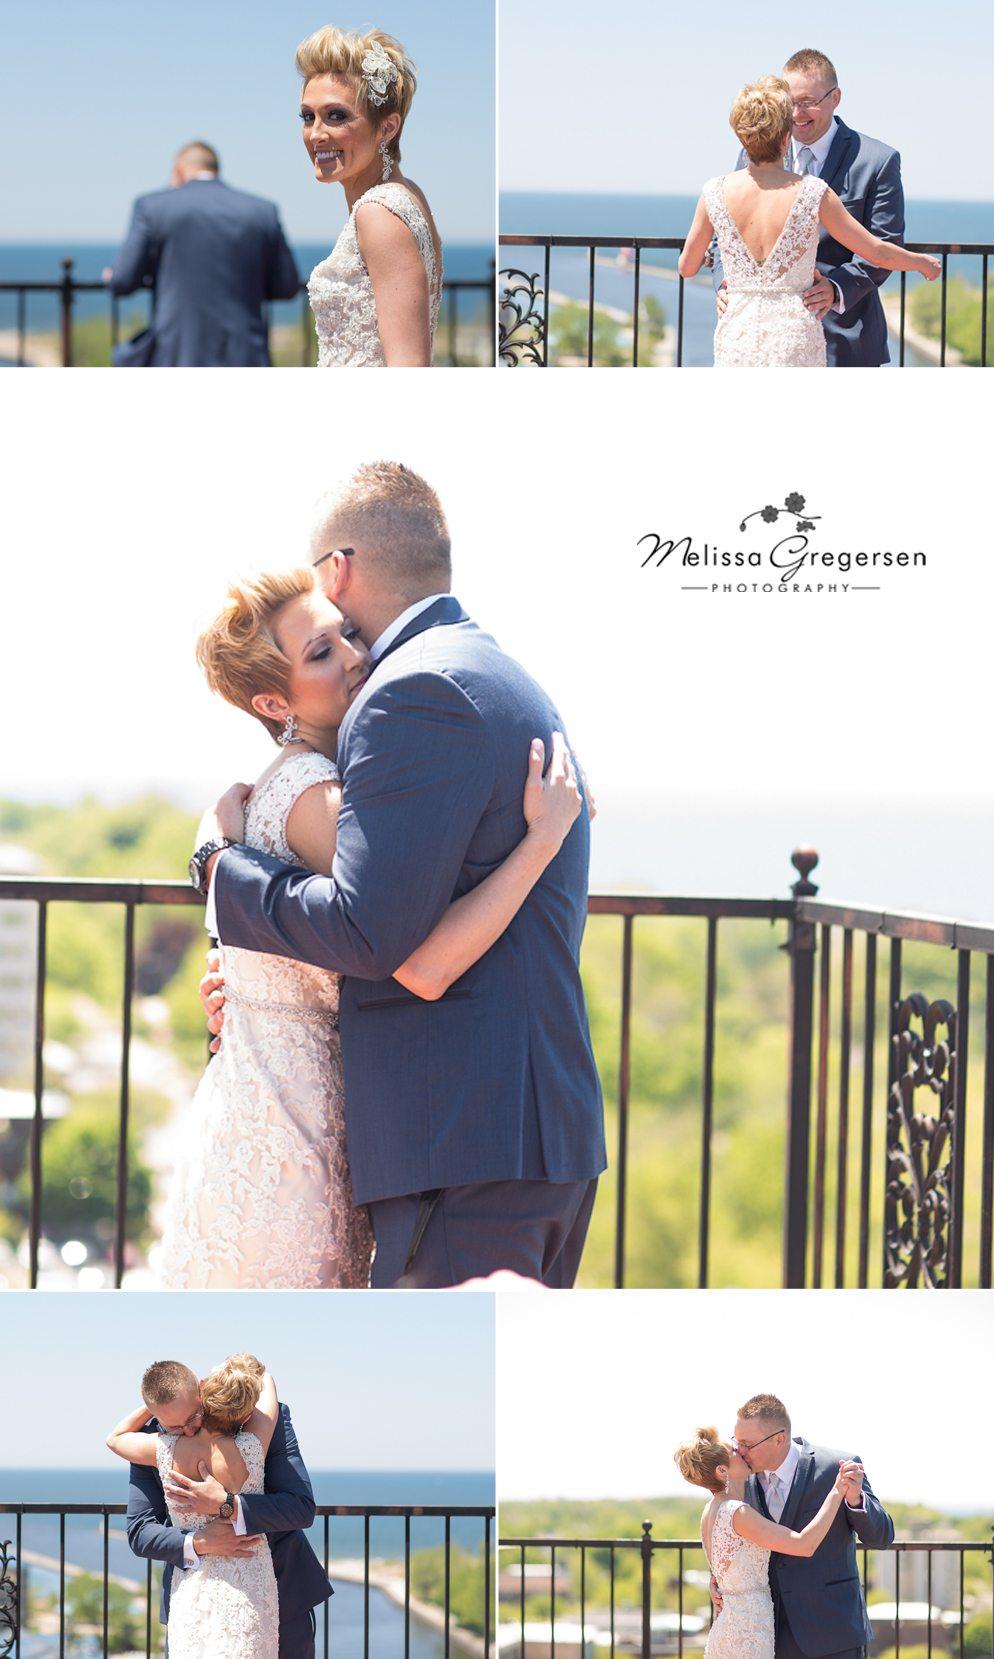 St. Joseph, MI Wedding Photography The Veranda Wedding Venue Gregersen Photography